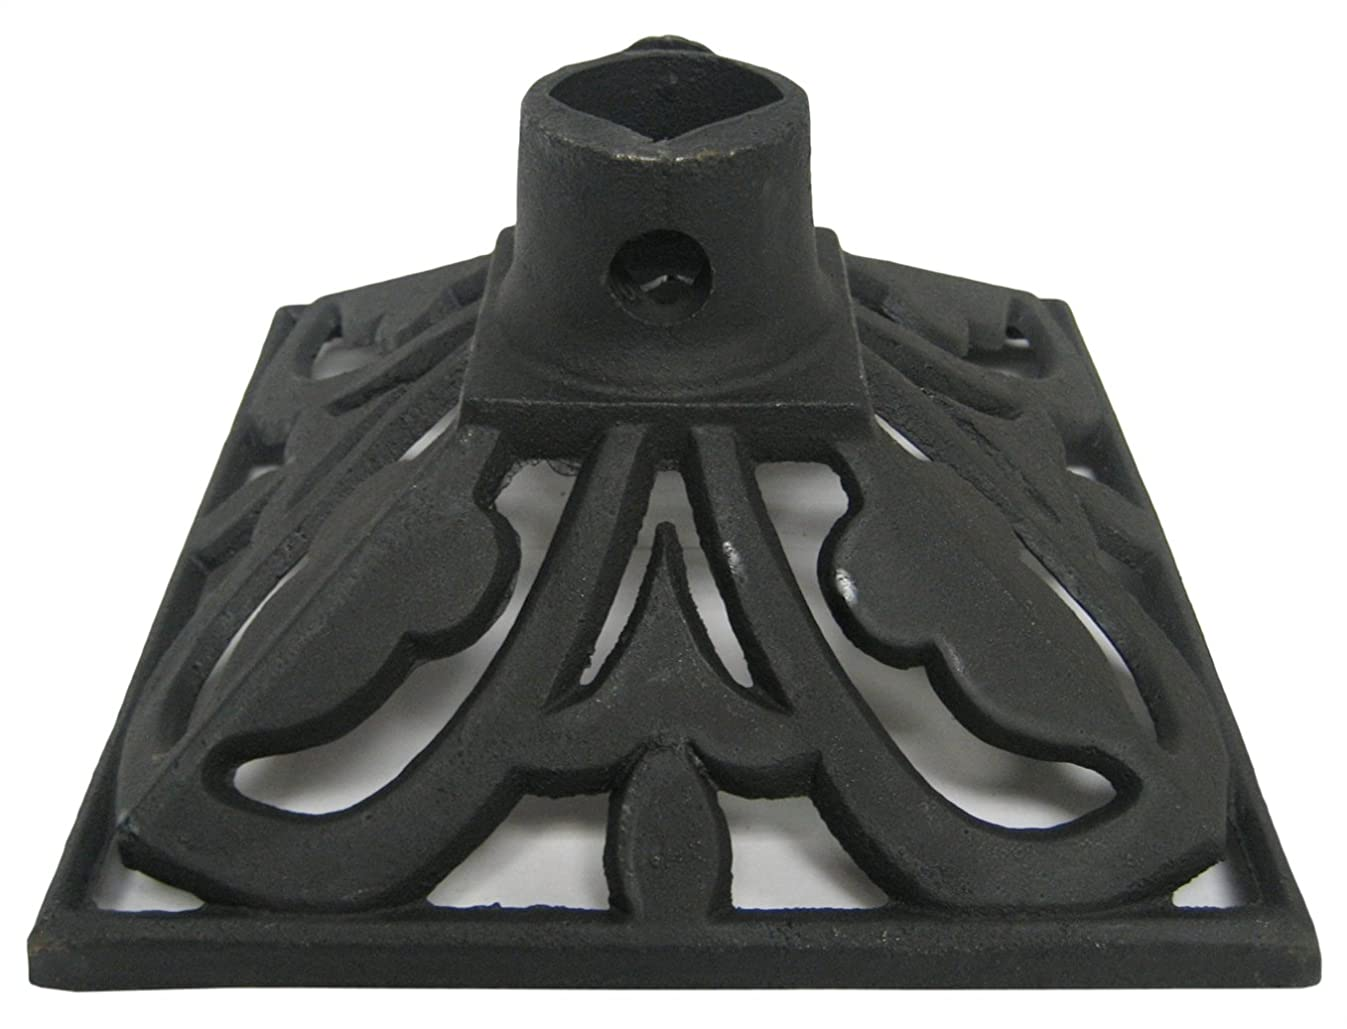 TIKI Brand Cast Iron Torch Stand, Black, 9.1L x 9.1W x 4.8H -Inches